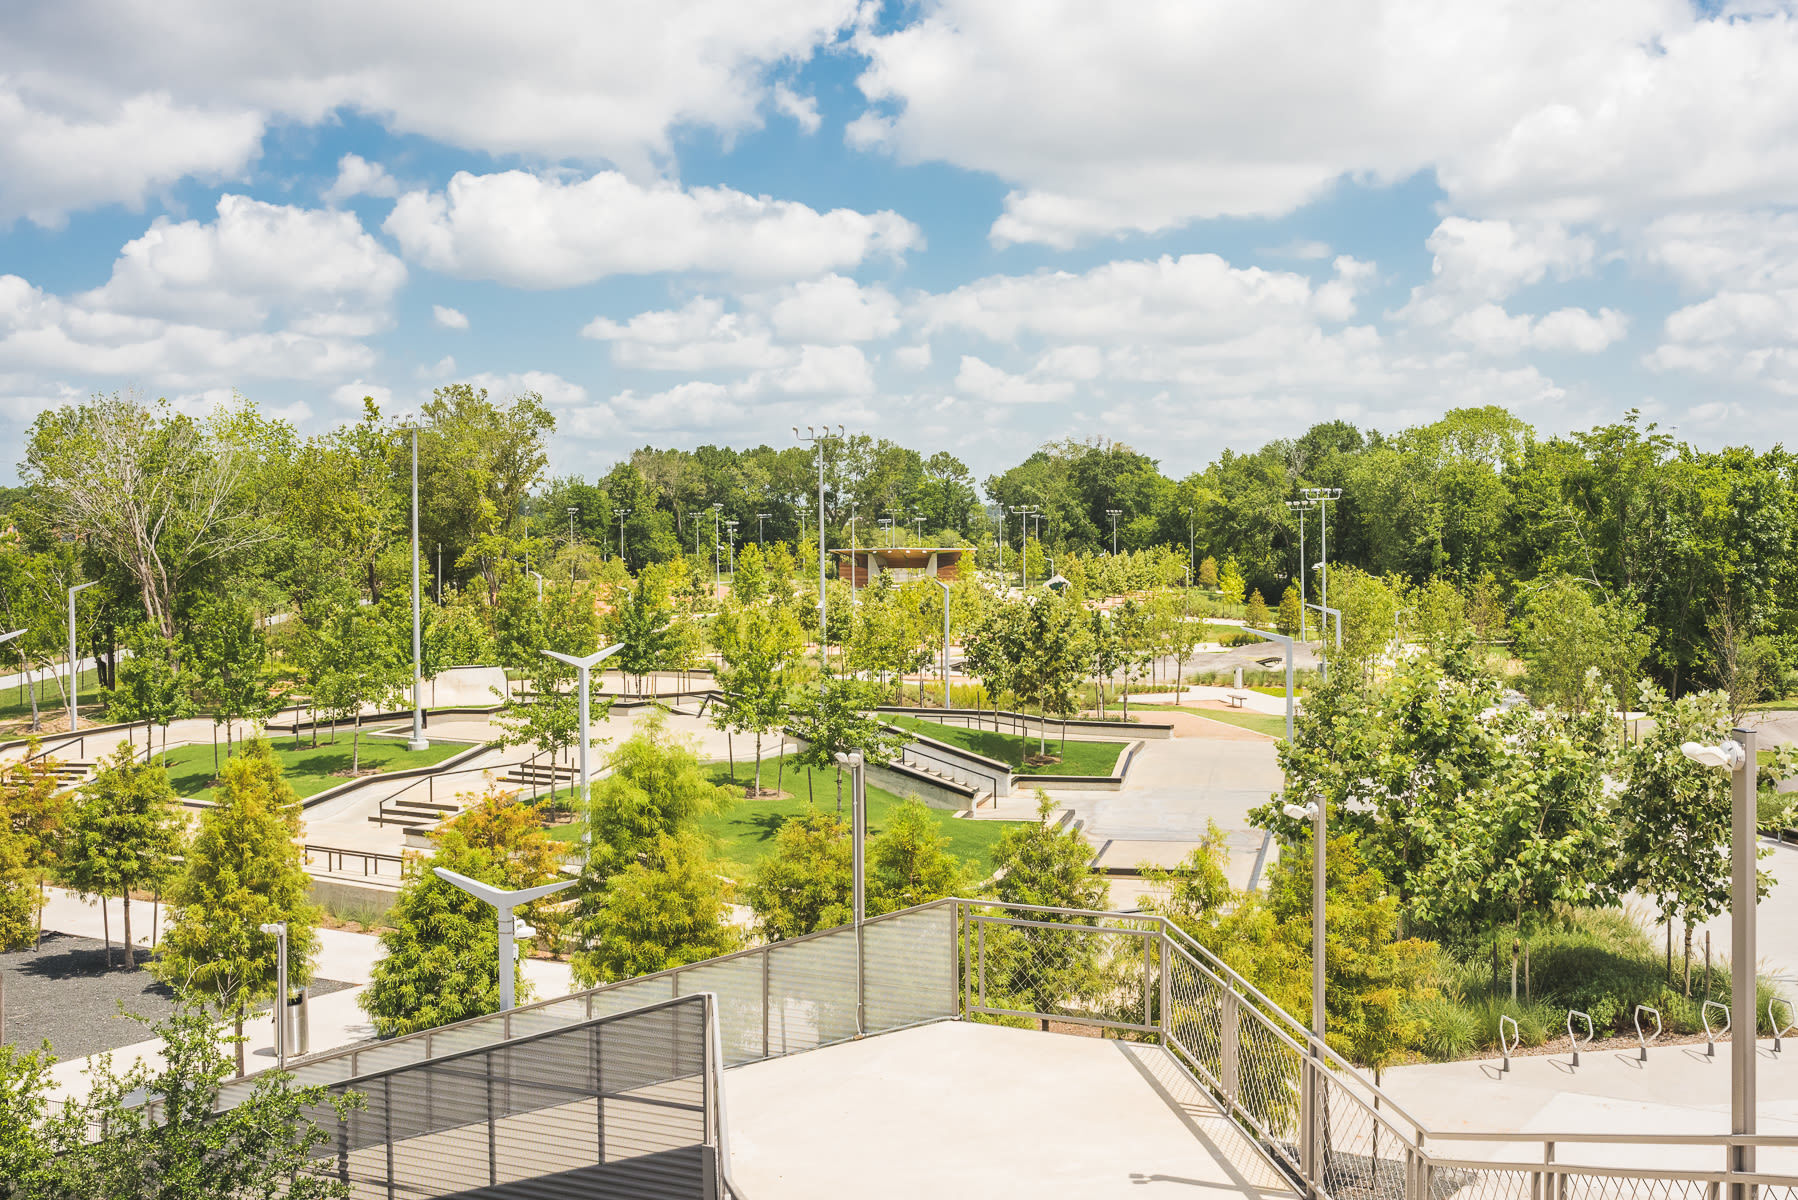 Rockstar Energy Bike Park landscape in Houston, TX